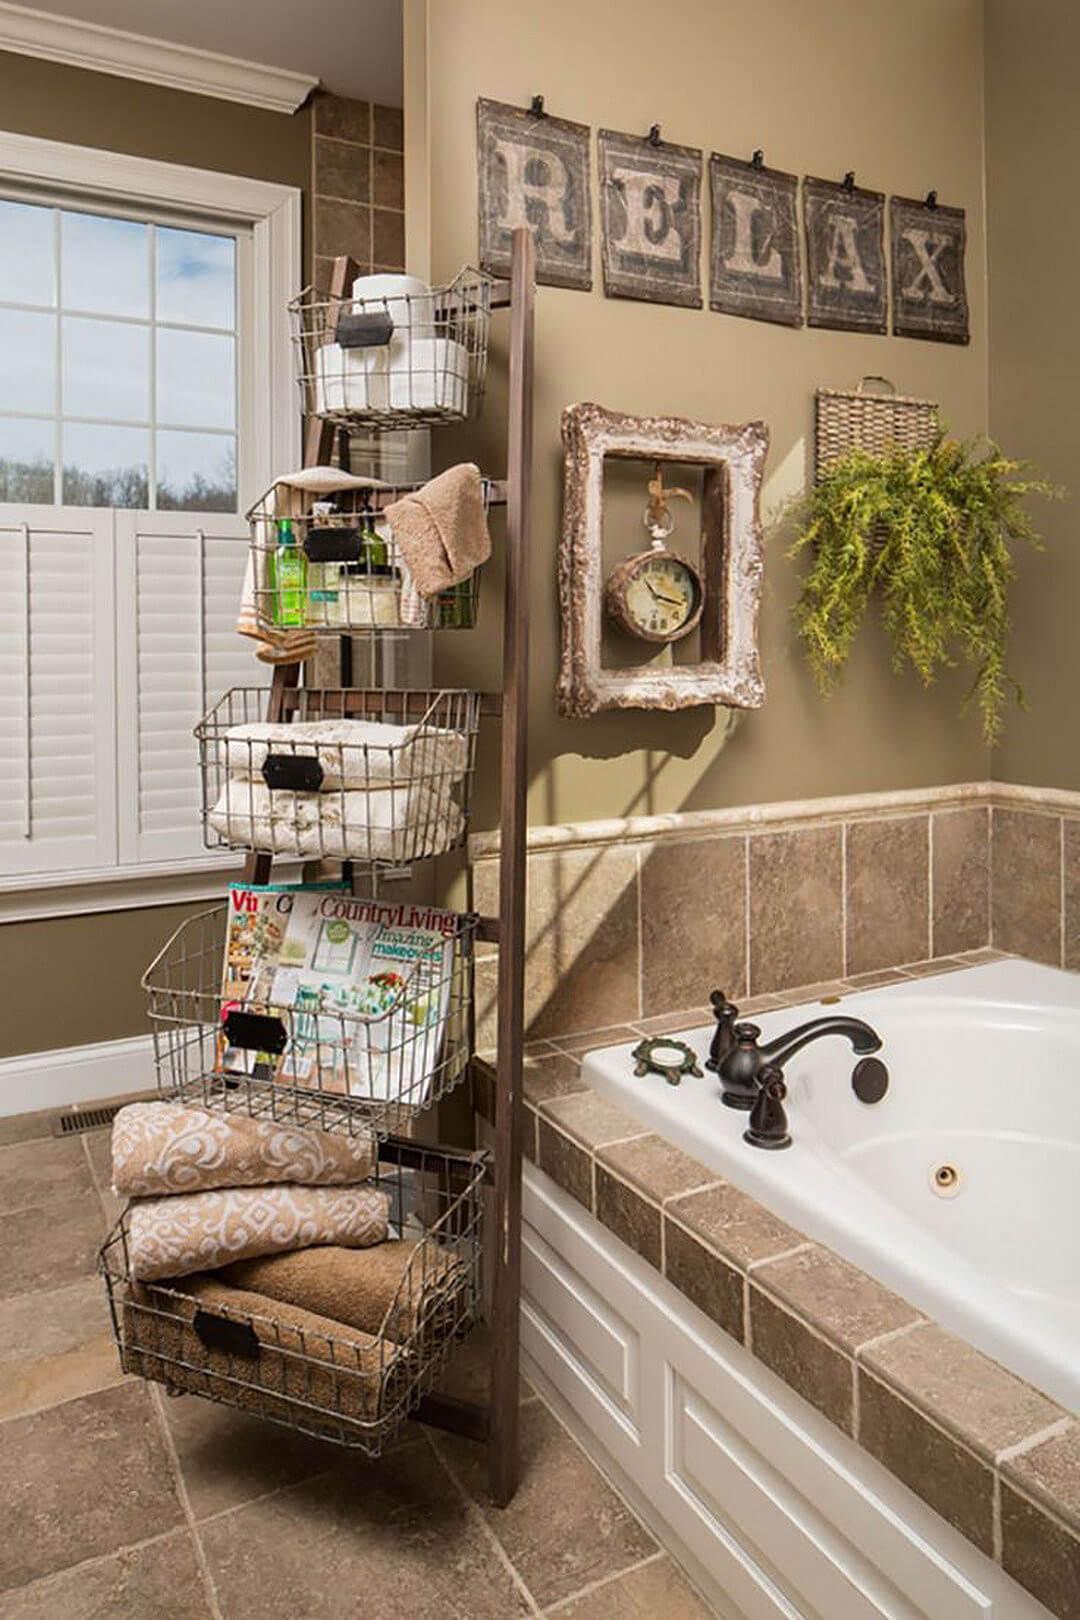 Newsstand Style Towel & Toiletries Rack